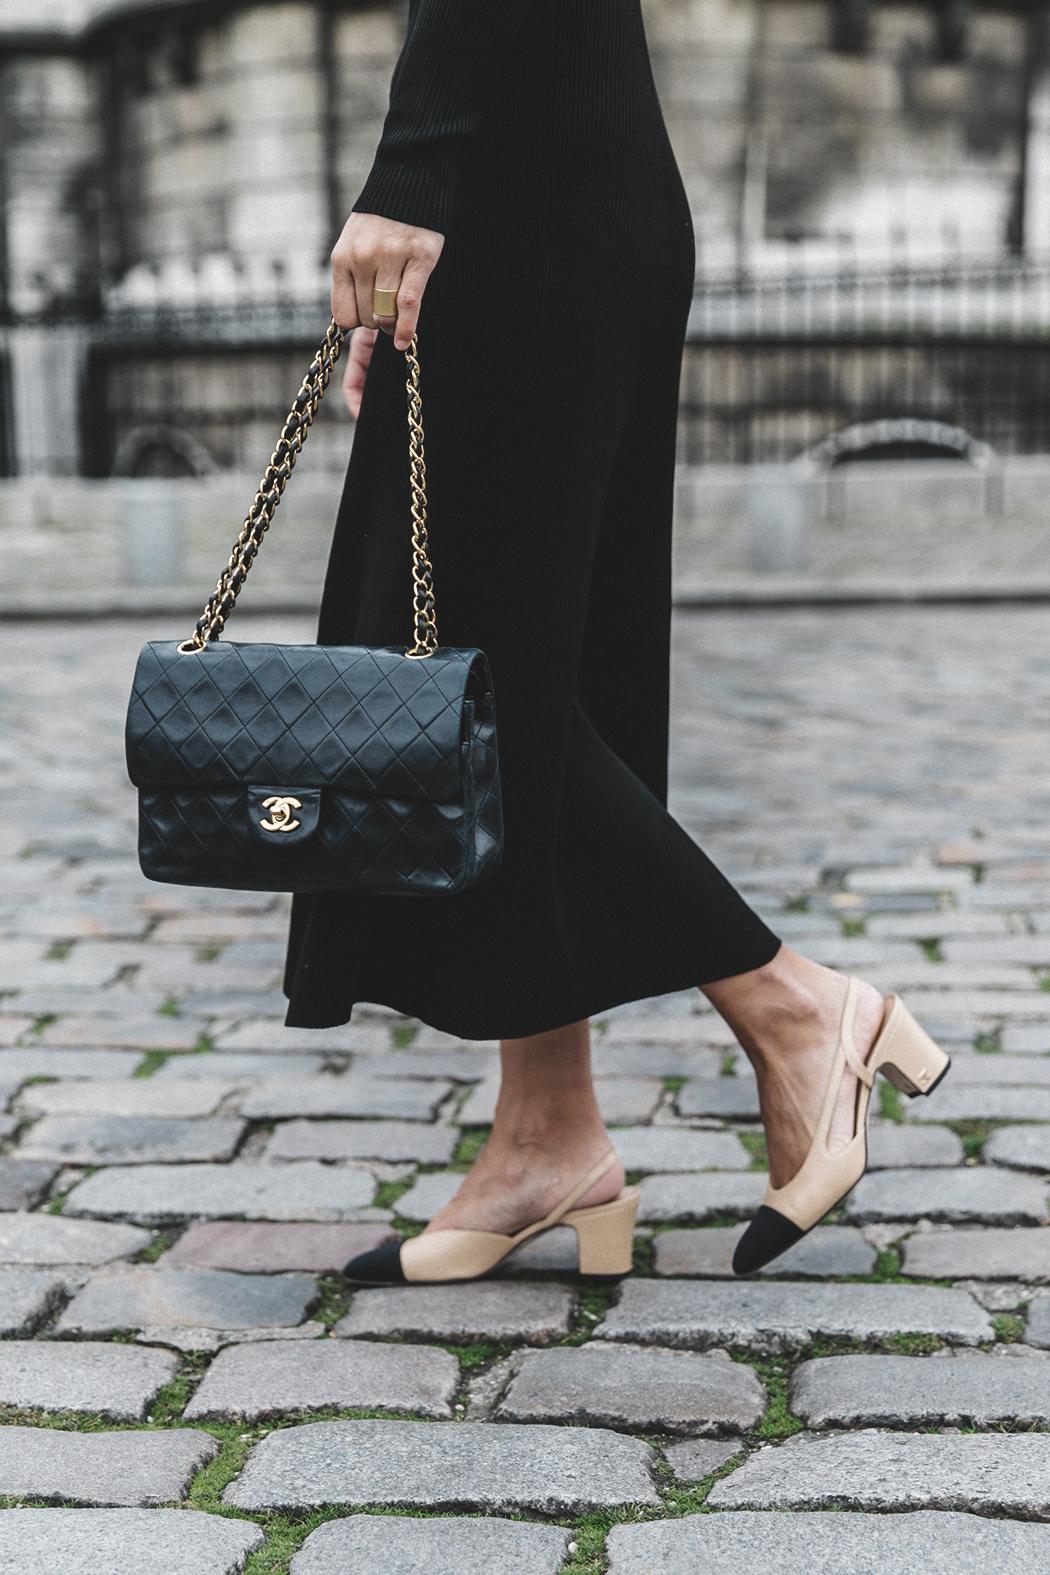 Backless_Dress-Black_Dress-Chanel_Shoes-Paris-PFW-Paris_Fashion_Week_Fall_2016-21